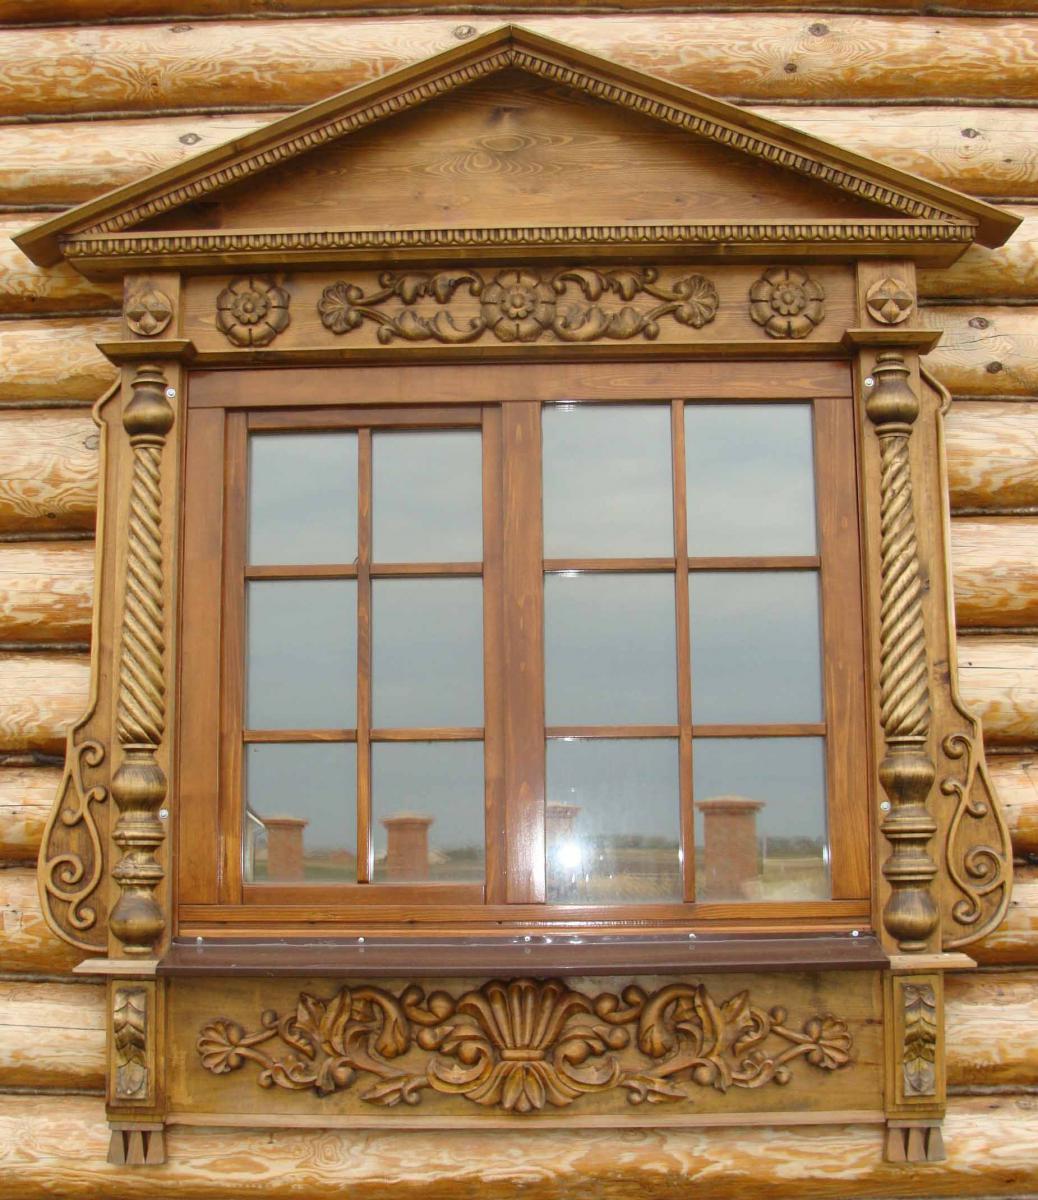 Декоративная резьба вокруг окна